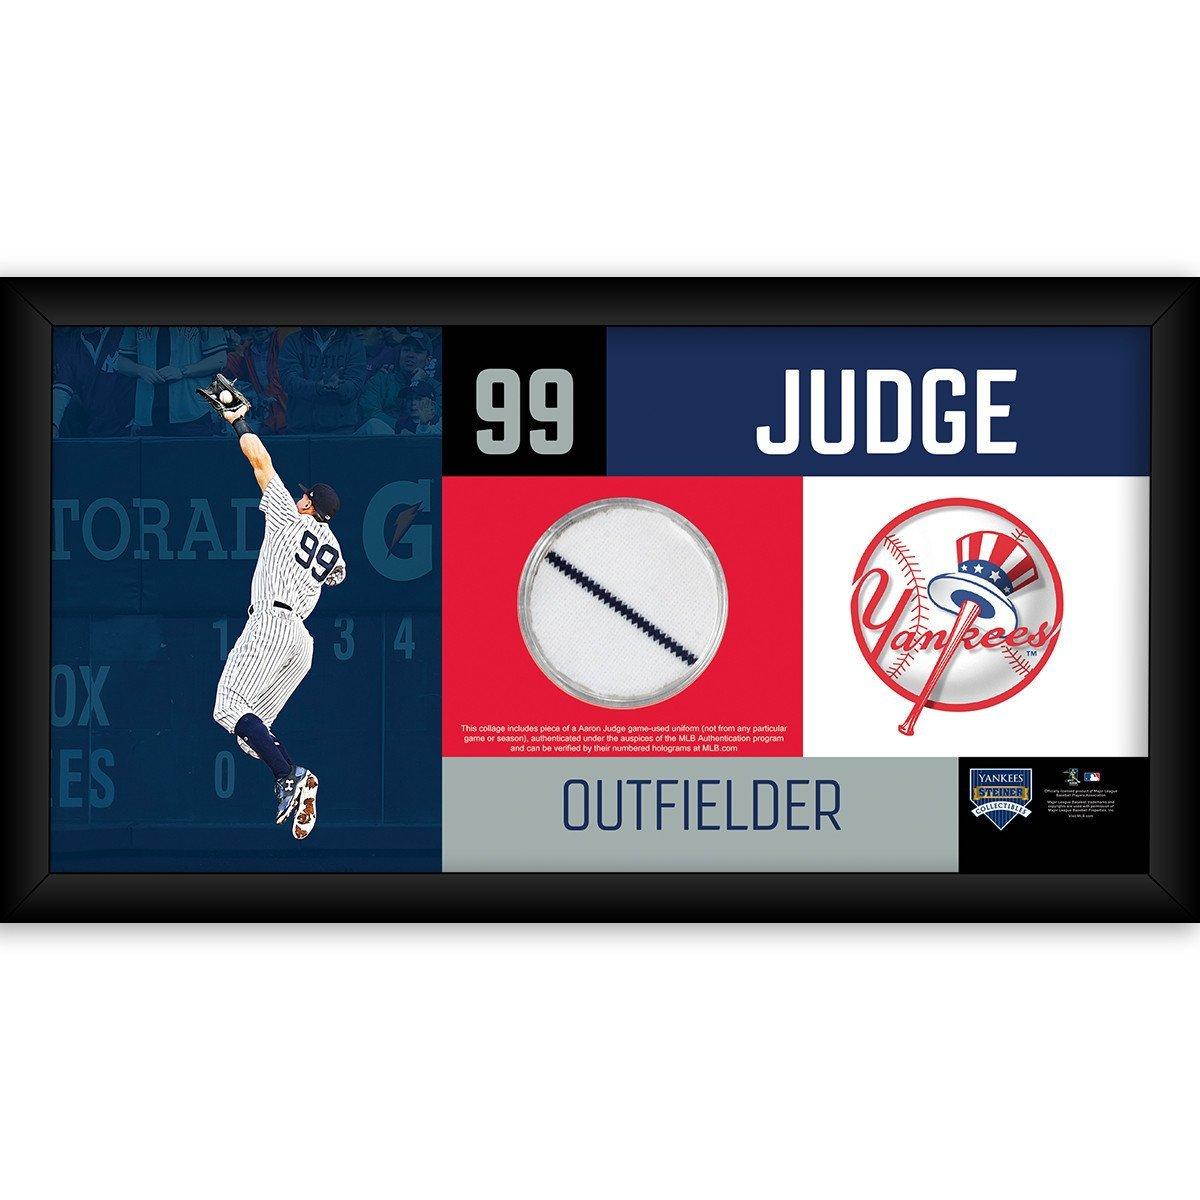 MLBニューヨークヤンキースアーロンJudgeニューヨークヤンキース4 x 8フレームwith Game Used Uniform swatchaaron Judgeニューヨークヤンキース4 x 8フレームwith Game Used Uniform見本   B076DWT4HY